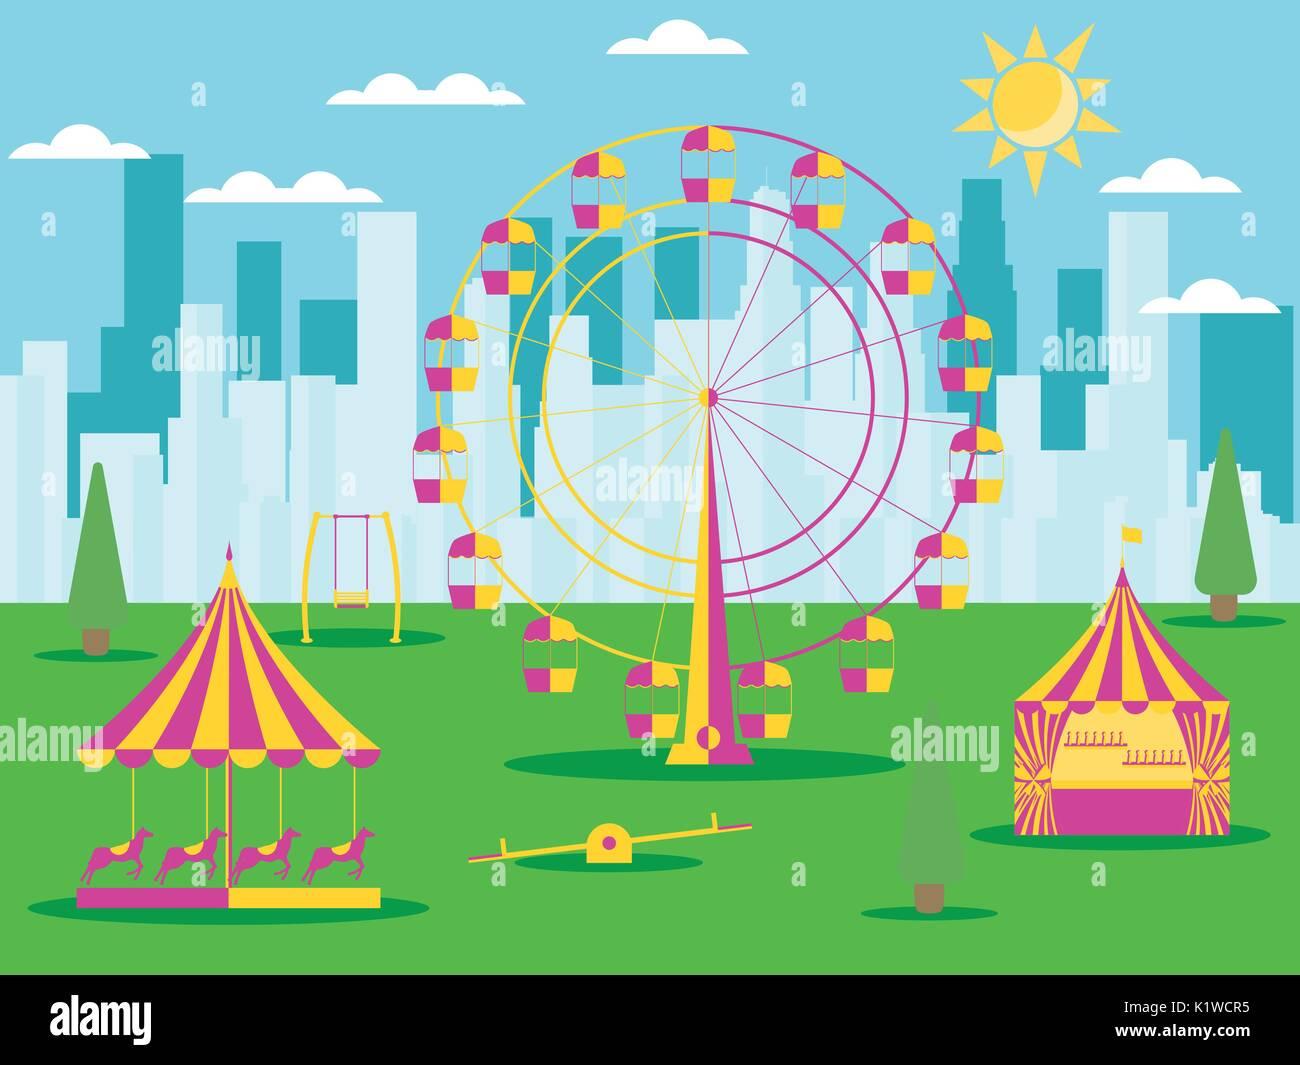 A Swing At An Amusement Park Stock Photos Amp A Swing At An